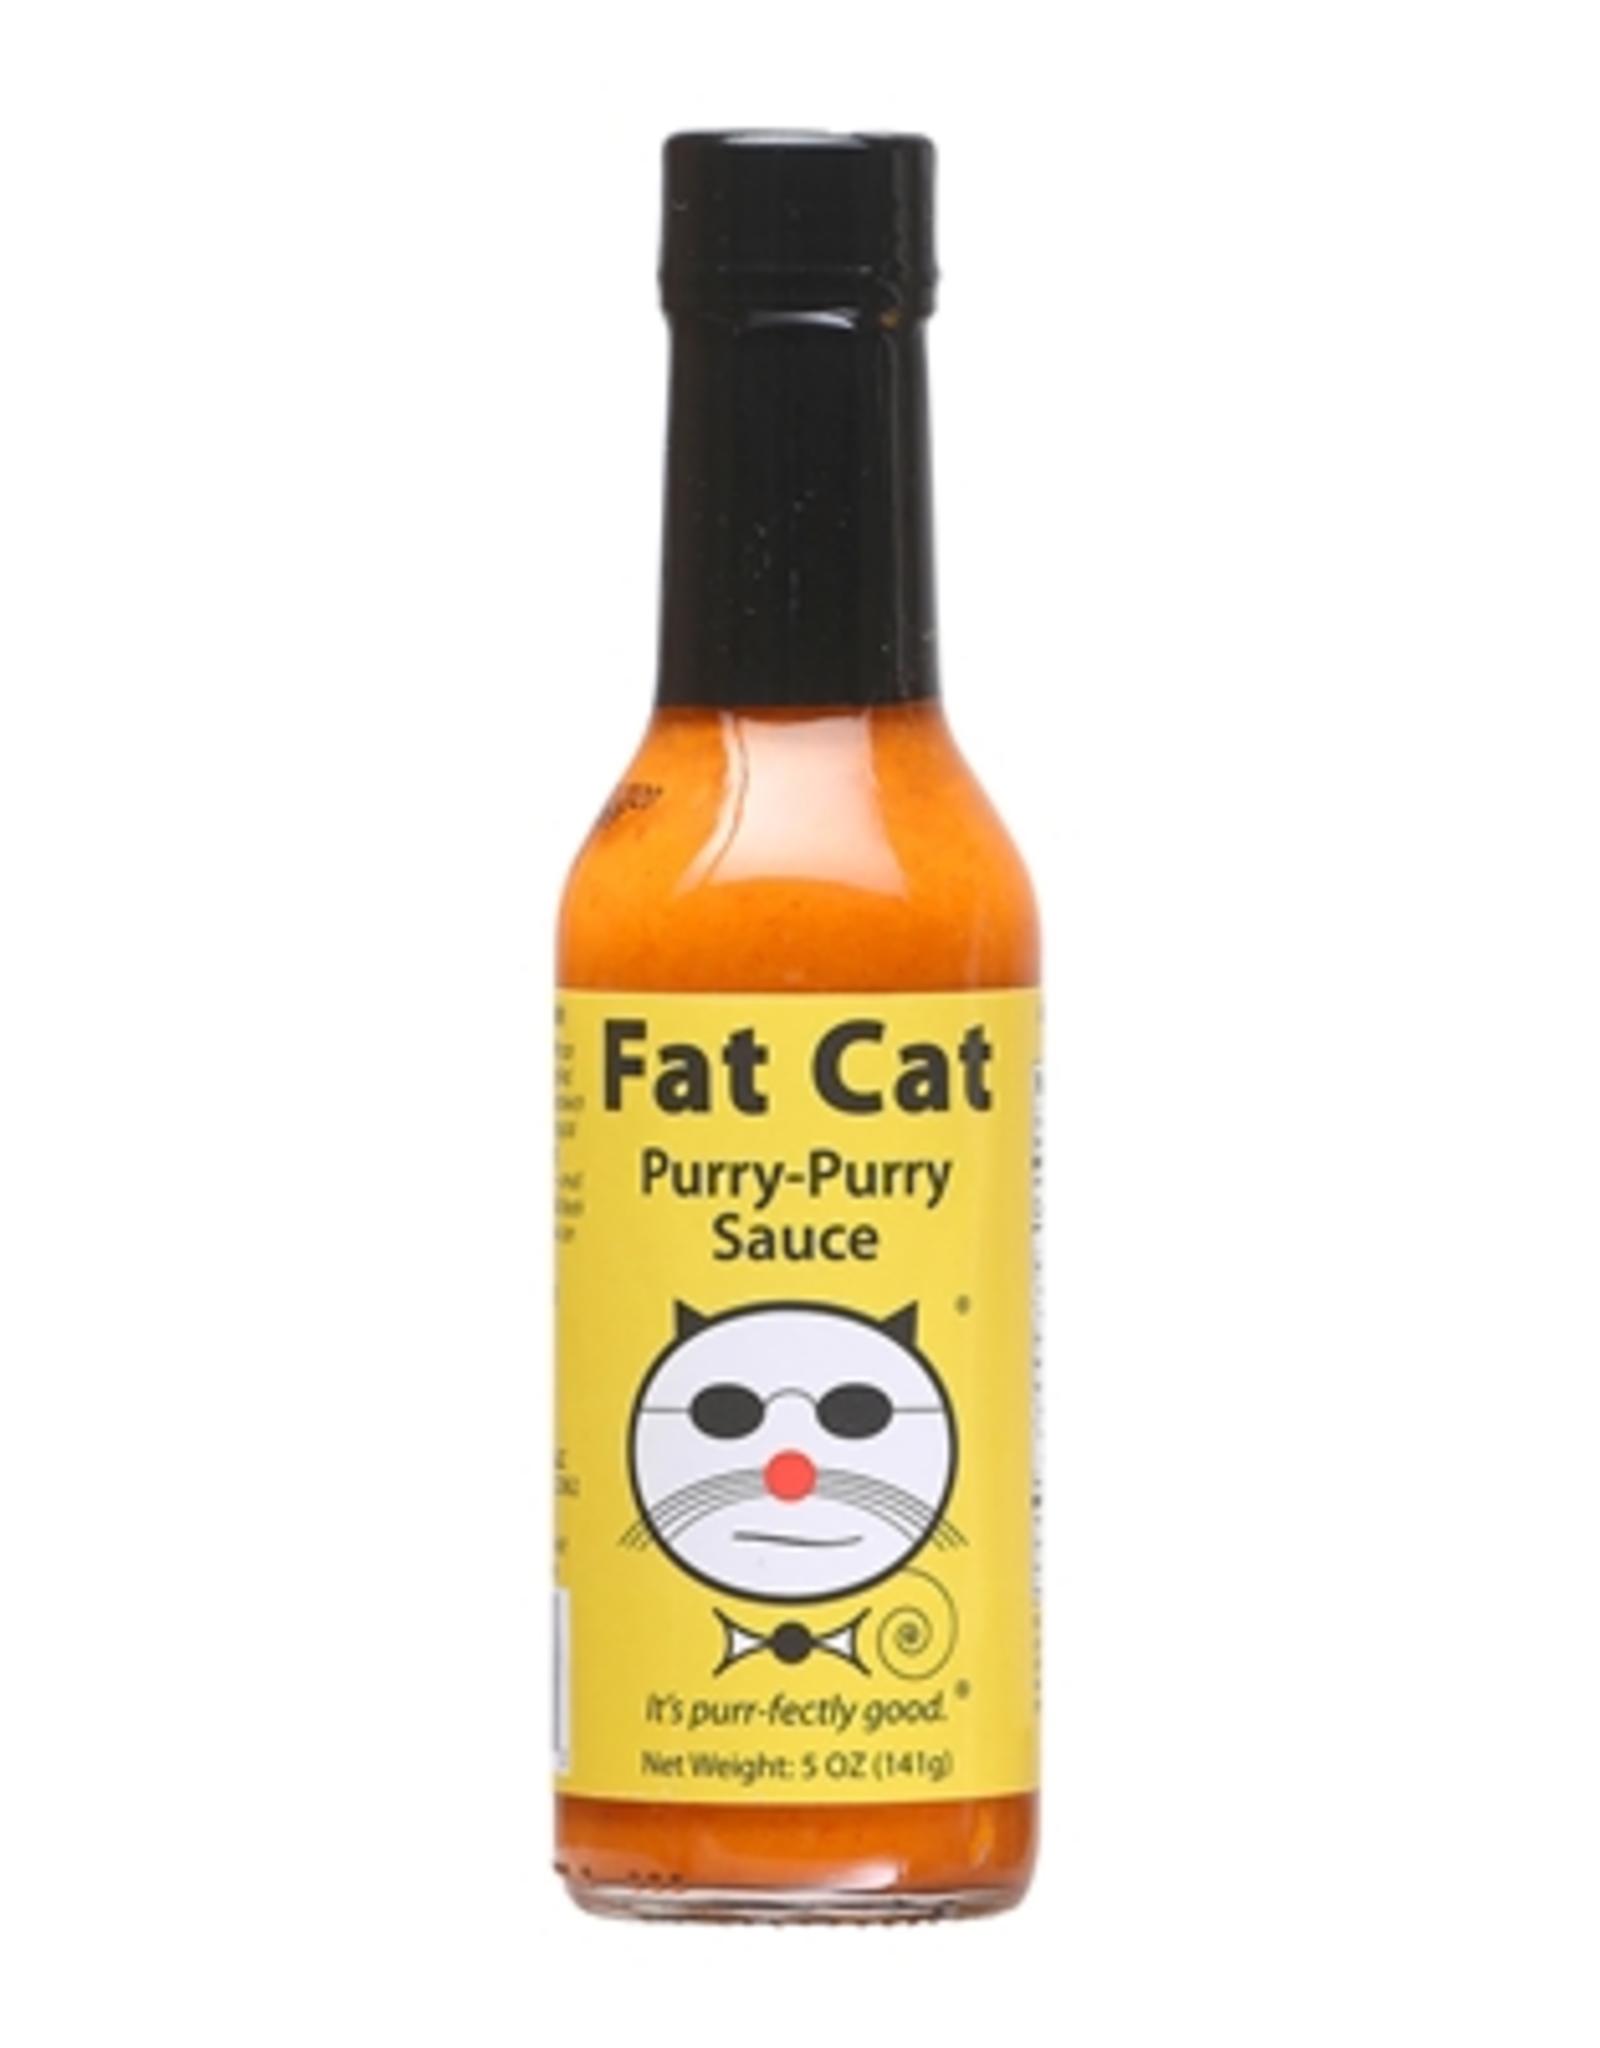 Hot Shots Distributing Fat Cat Purry-Purry Hot Sauce